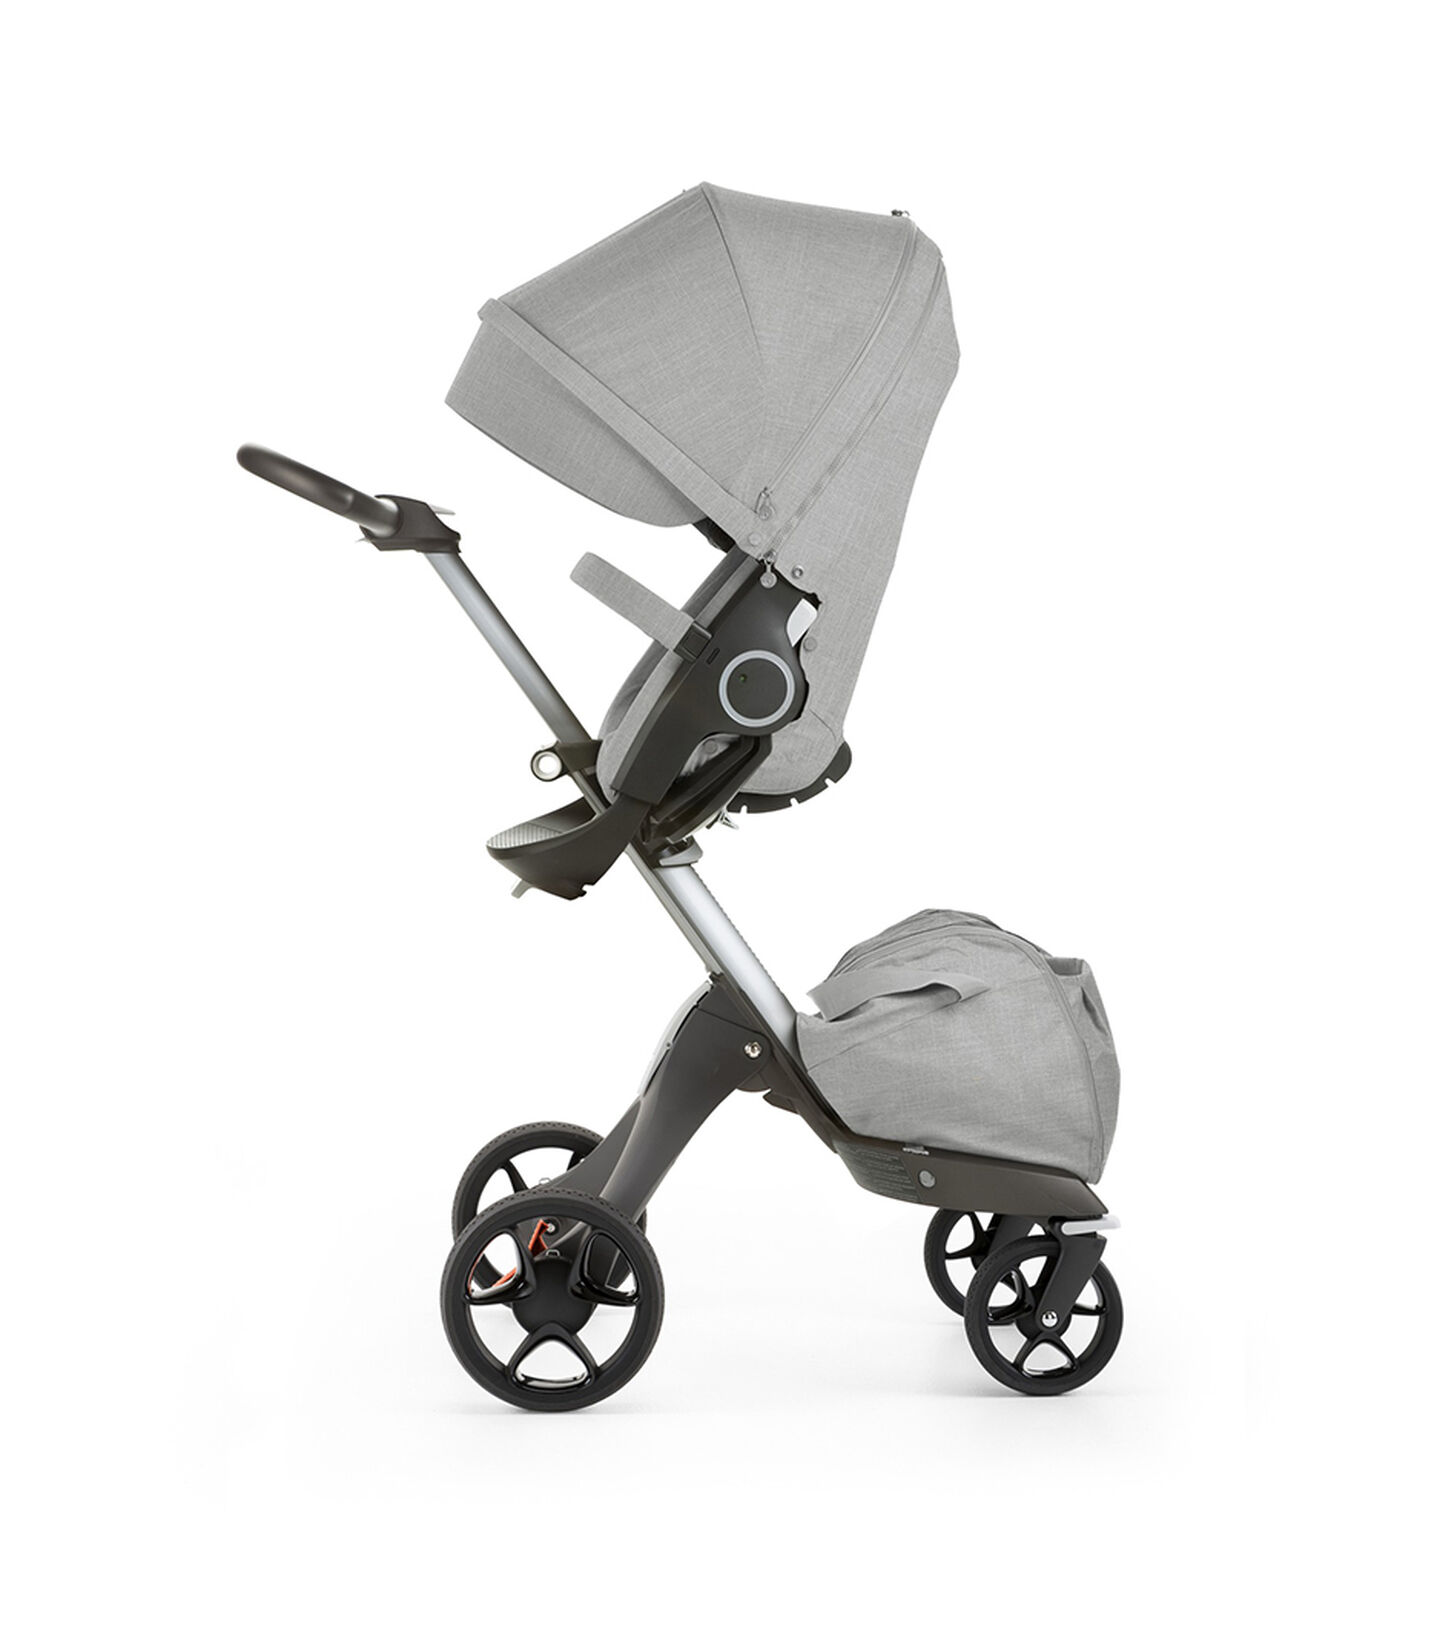 Stokke® Xplory® with Stokke® Stroller Seat, parent facing, active position. Grey Melange. New wheels 2016.